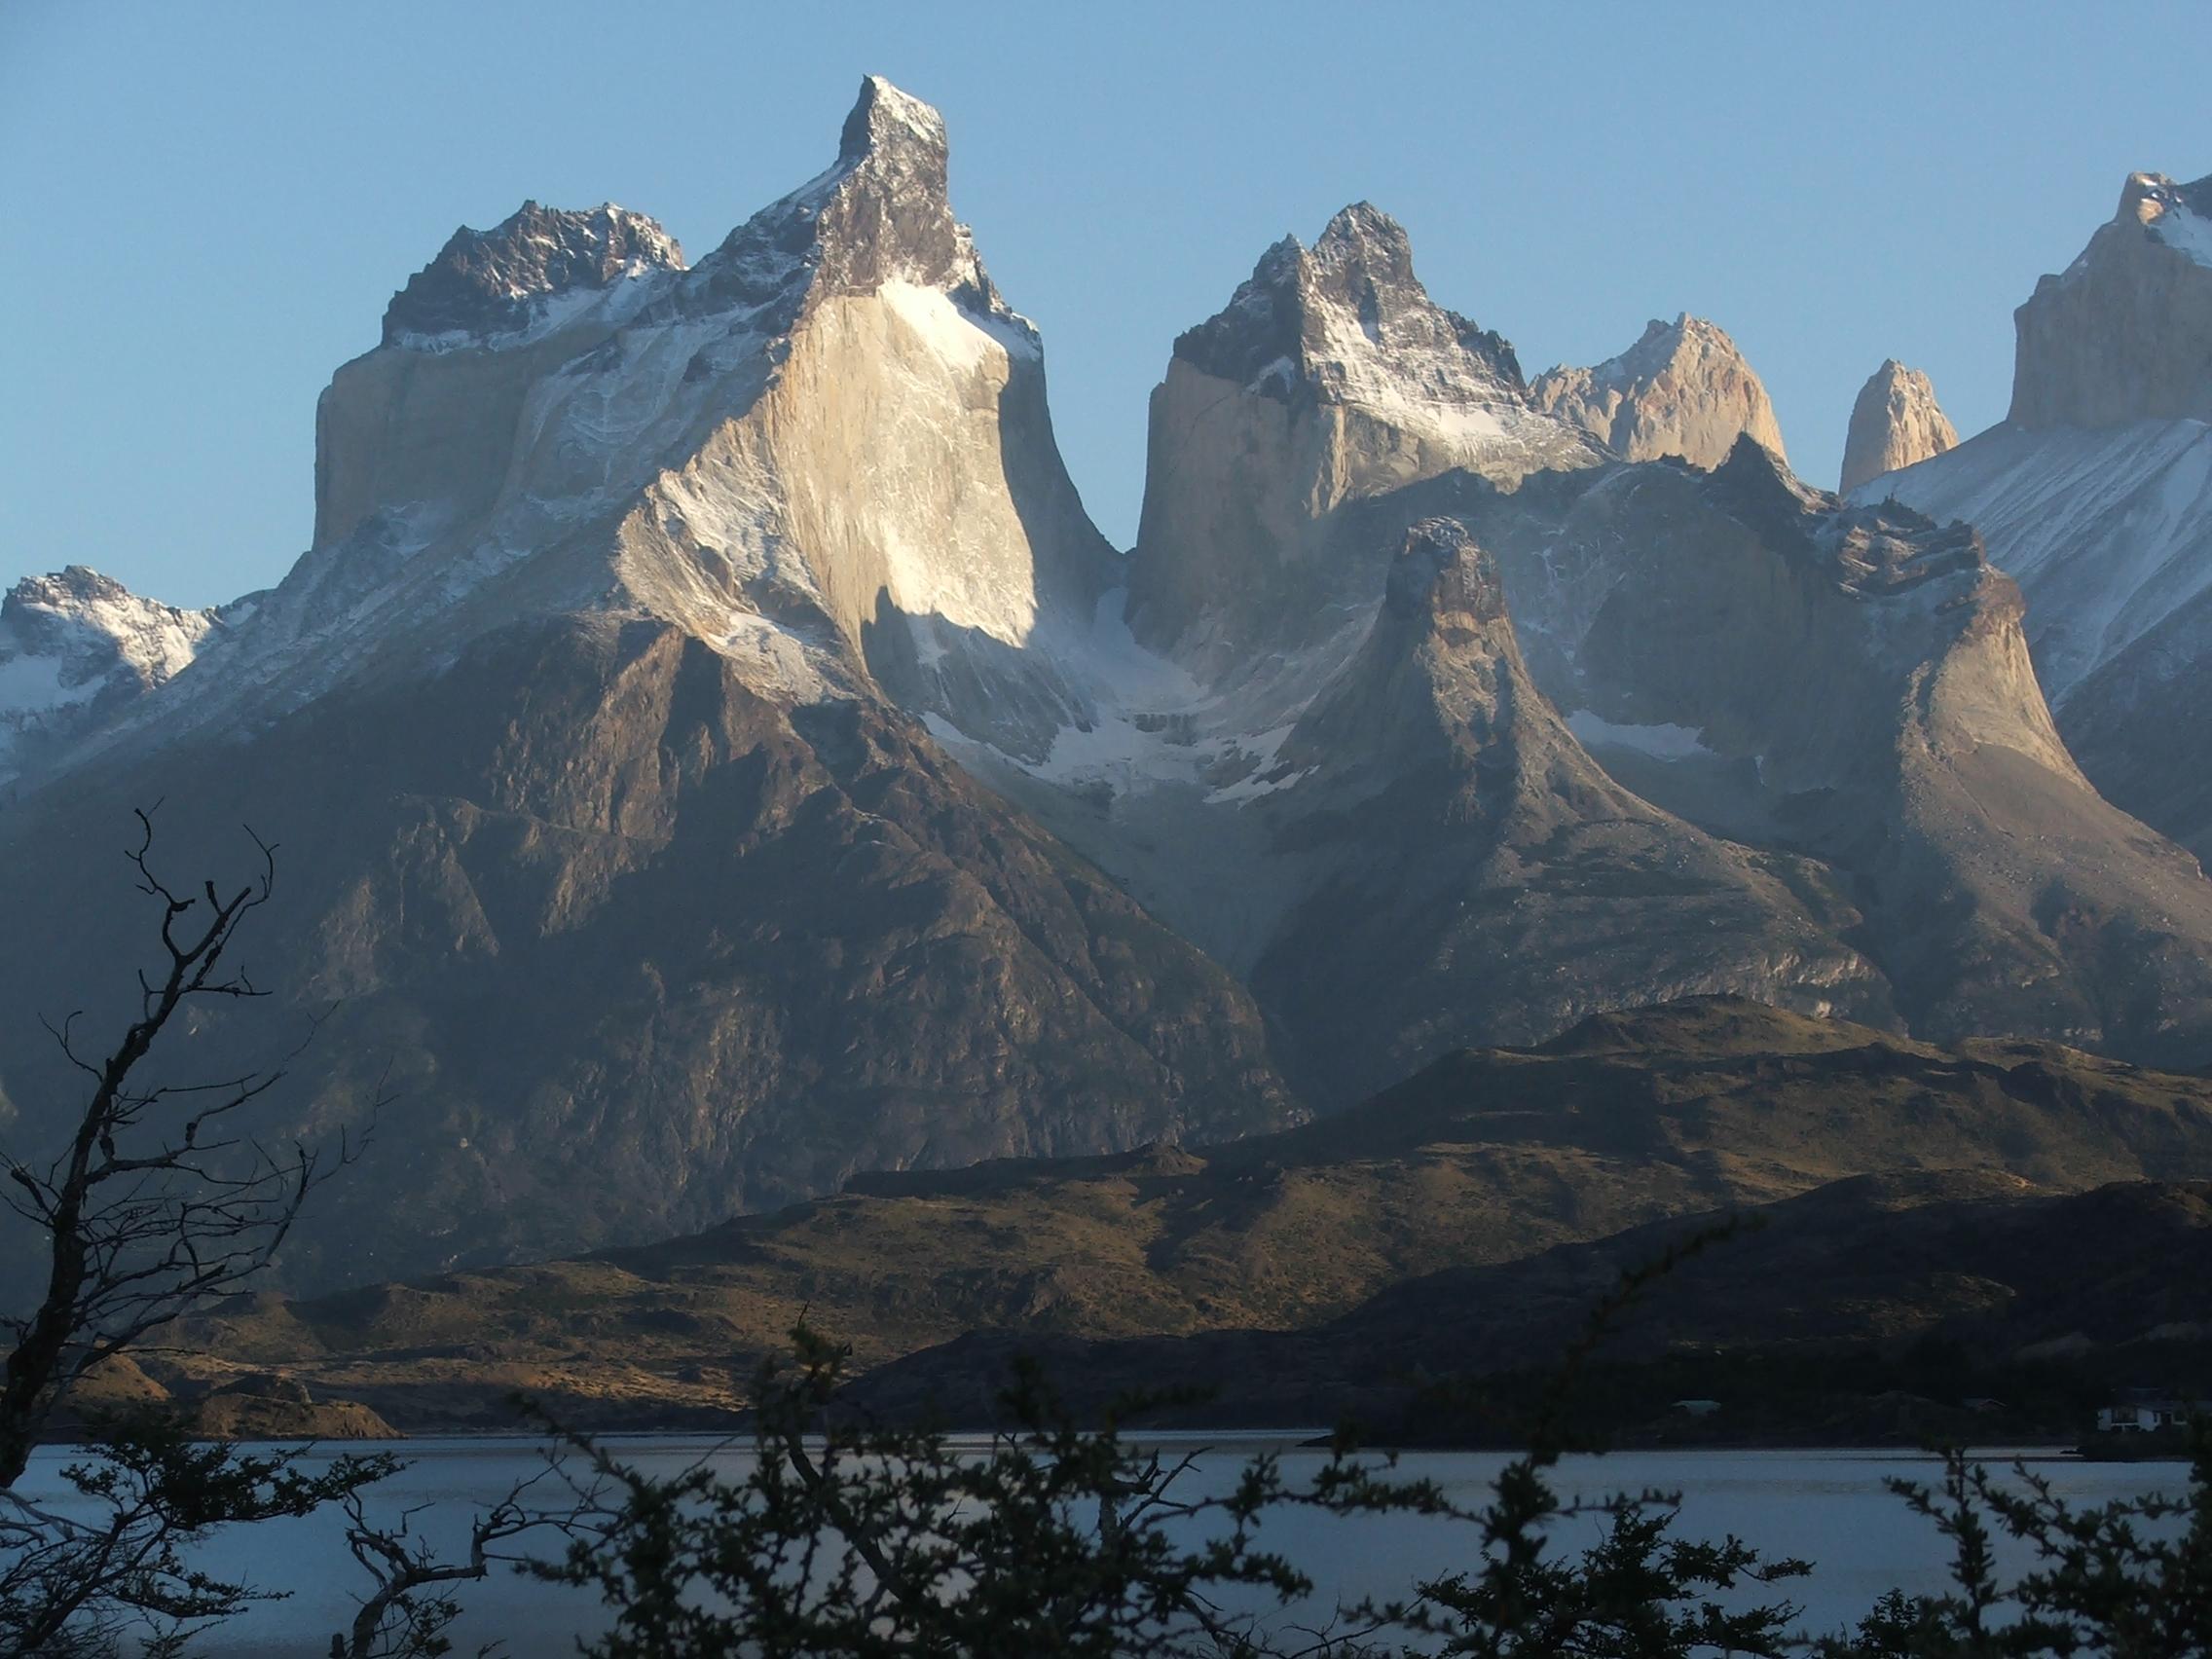 Los Cuernos at Torres del Paine National Park, southern Chile (© 2009 clasticdetritus.com)